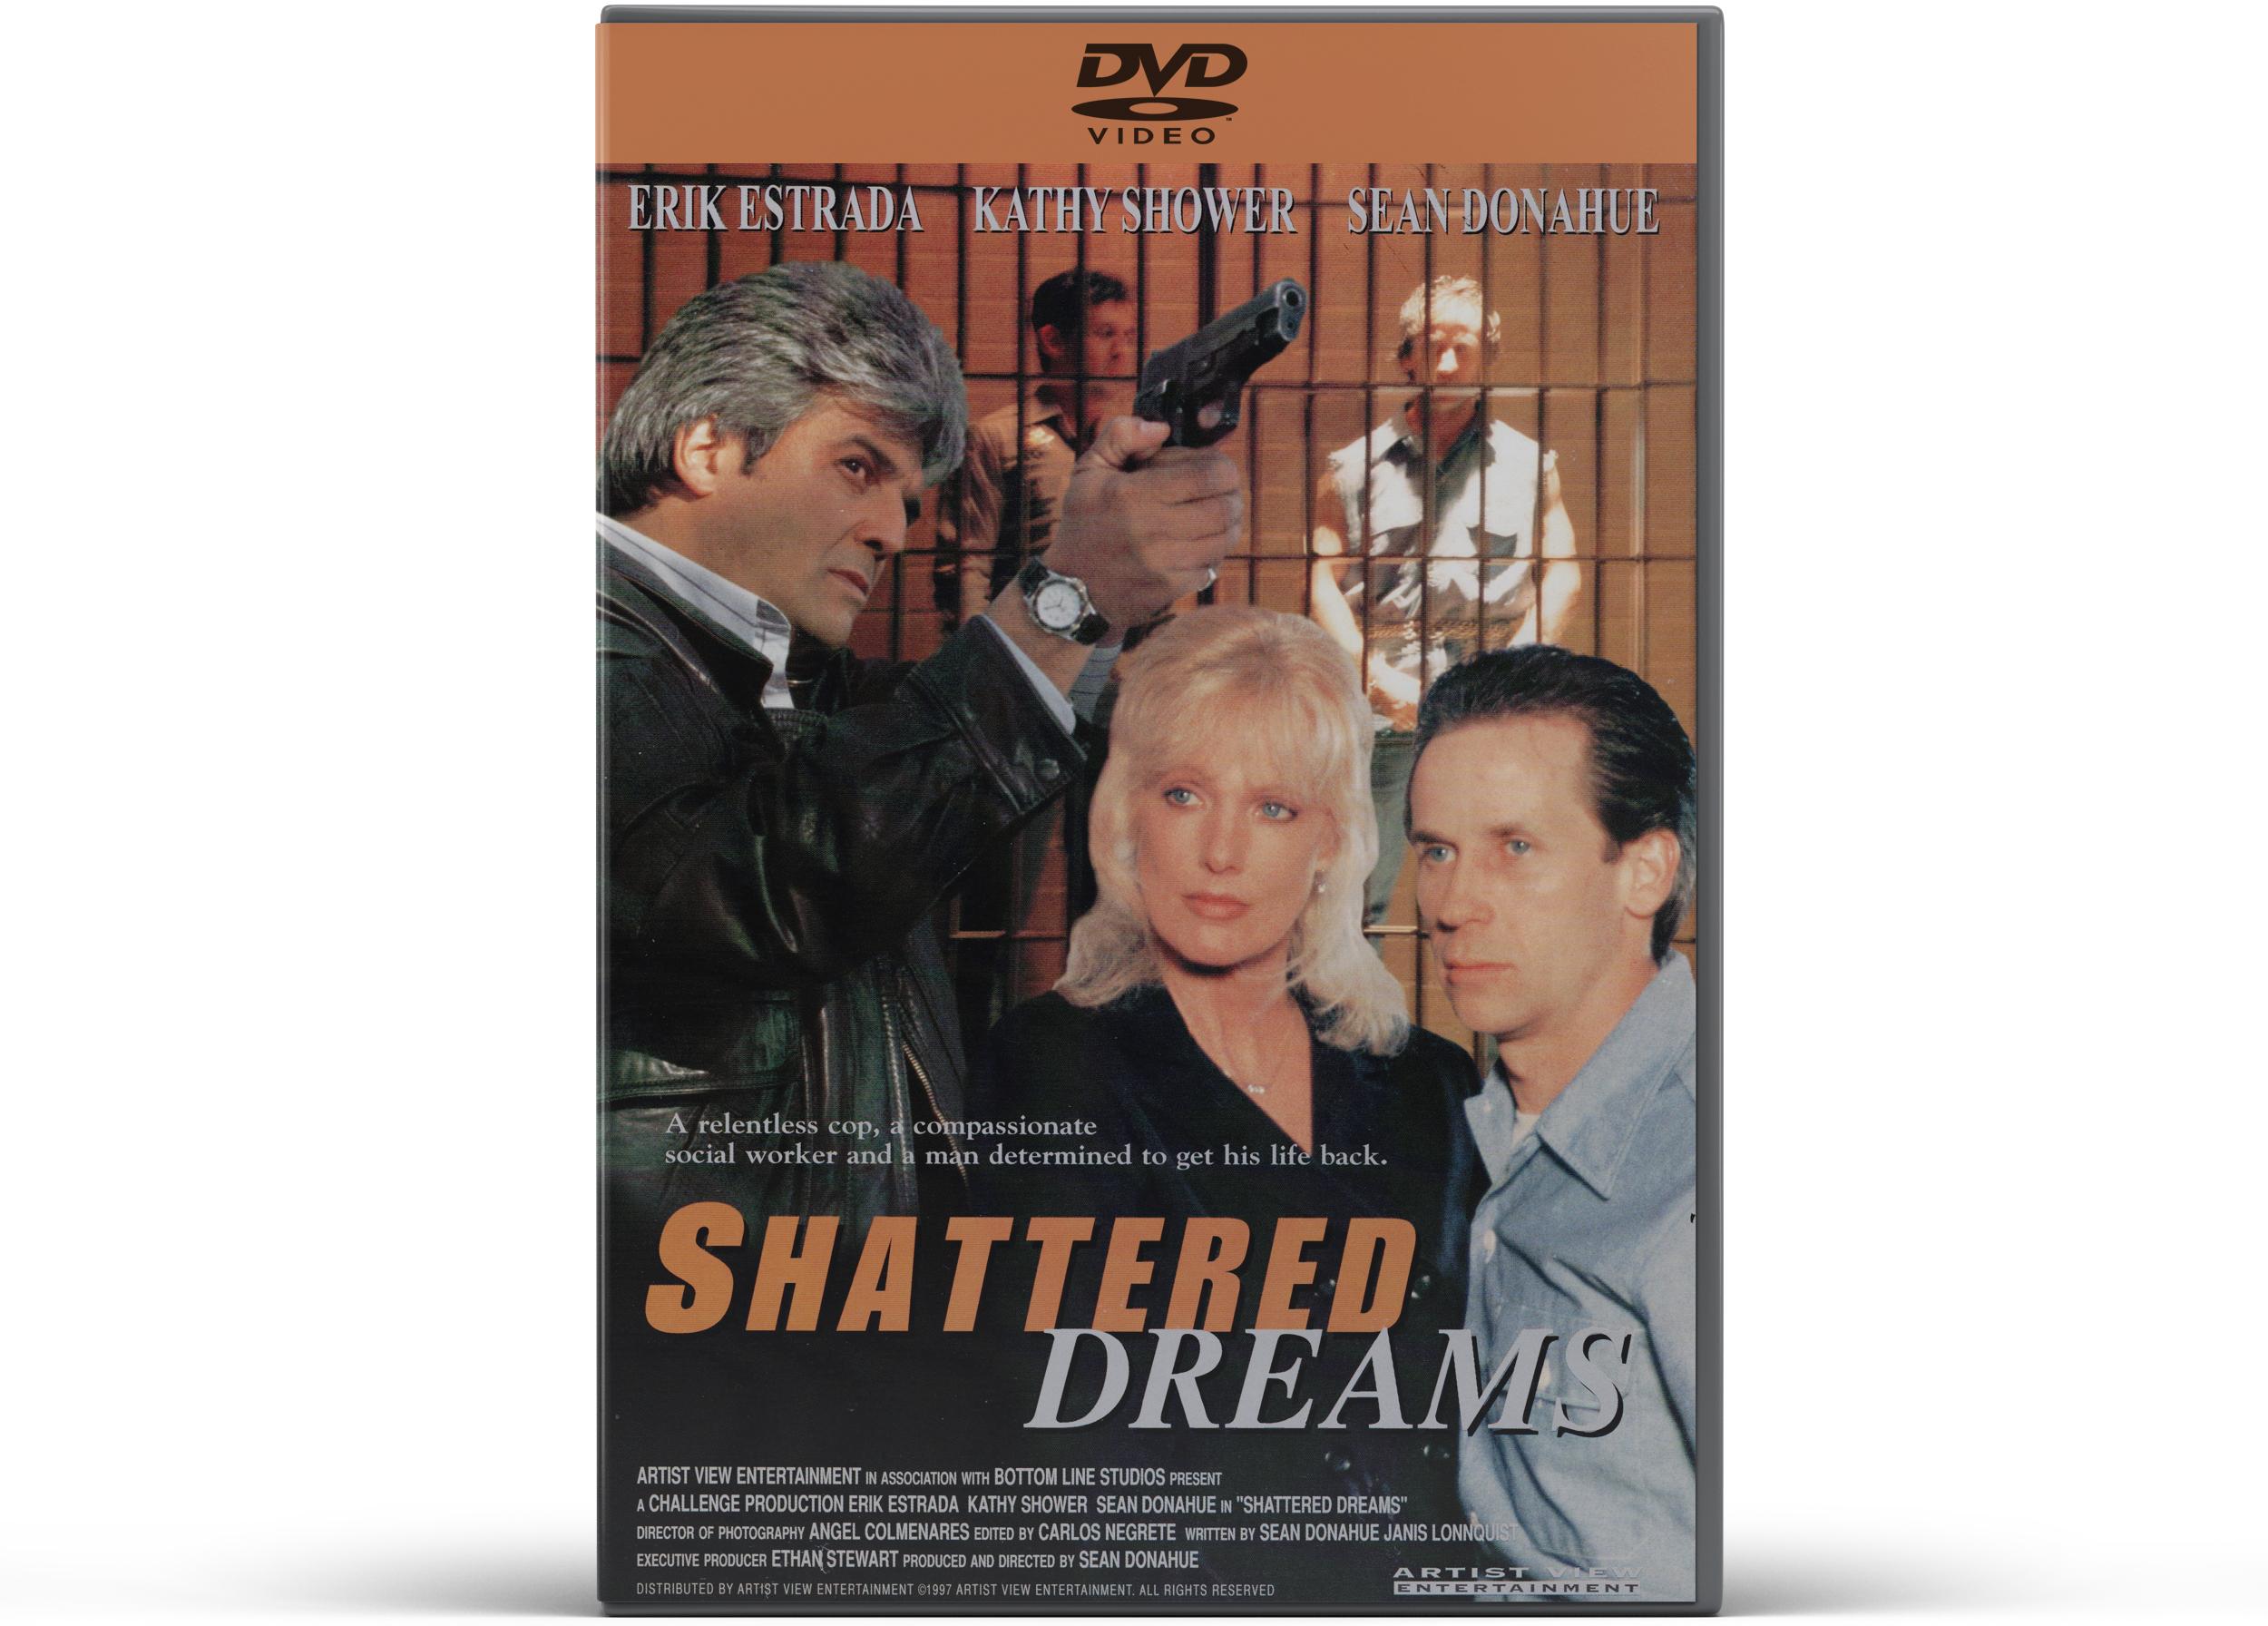 Shattered Dreams DVD (trimmed).jpg